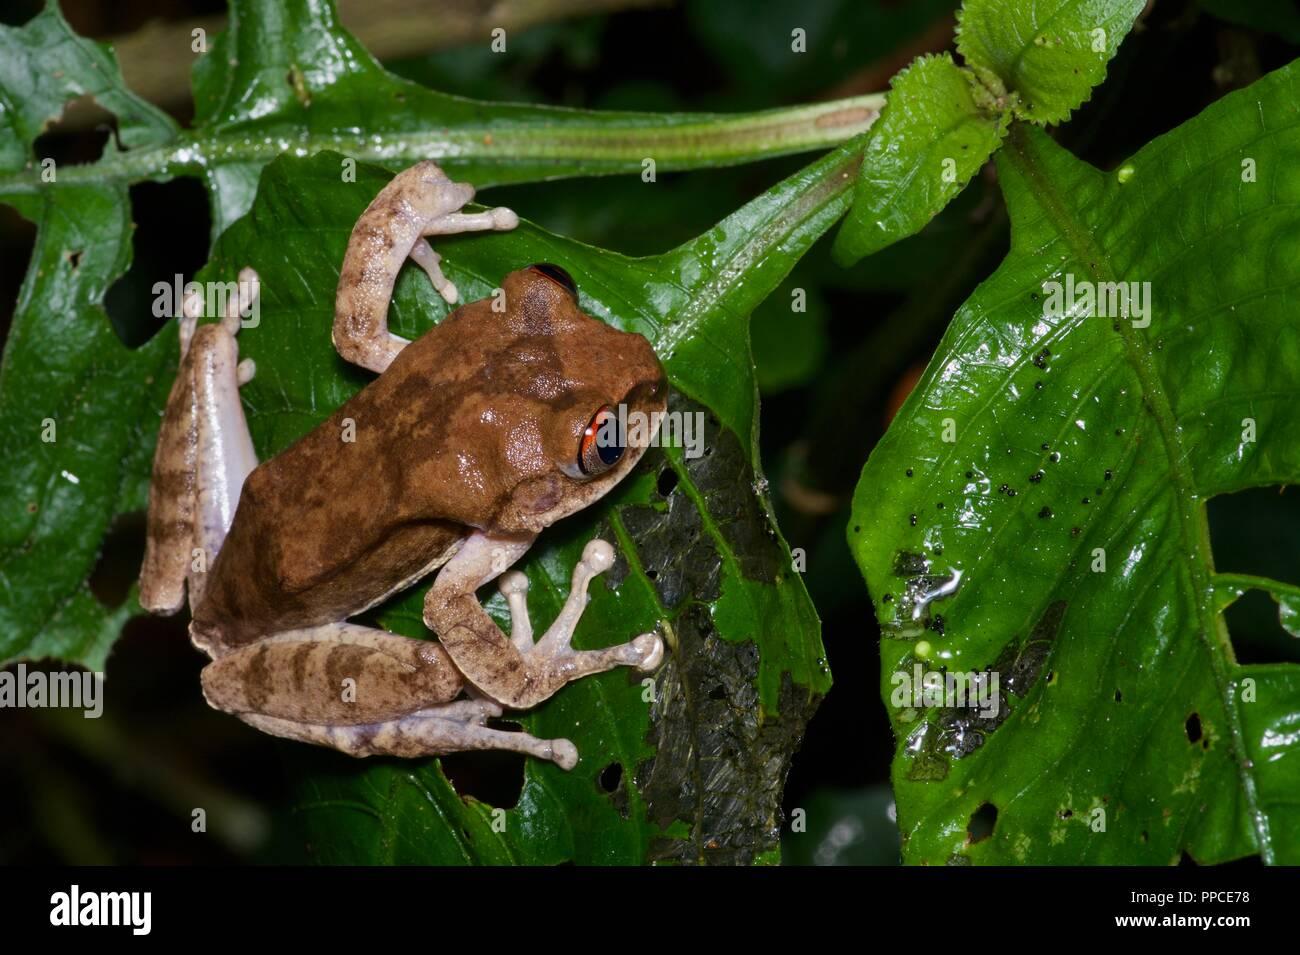 A Night Spirit Frog (Leptopelis spiritusnoctis) in wet leaves at night in Atewa Range Forest Reserve, Ghana, West Africa - Stock Image